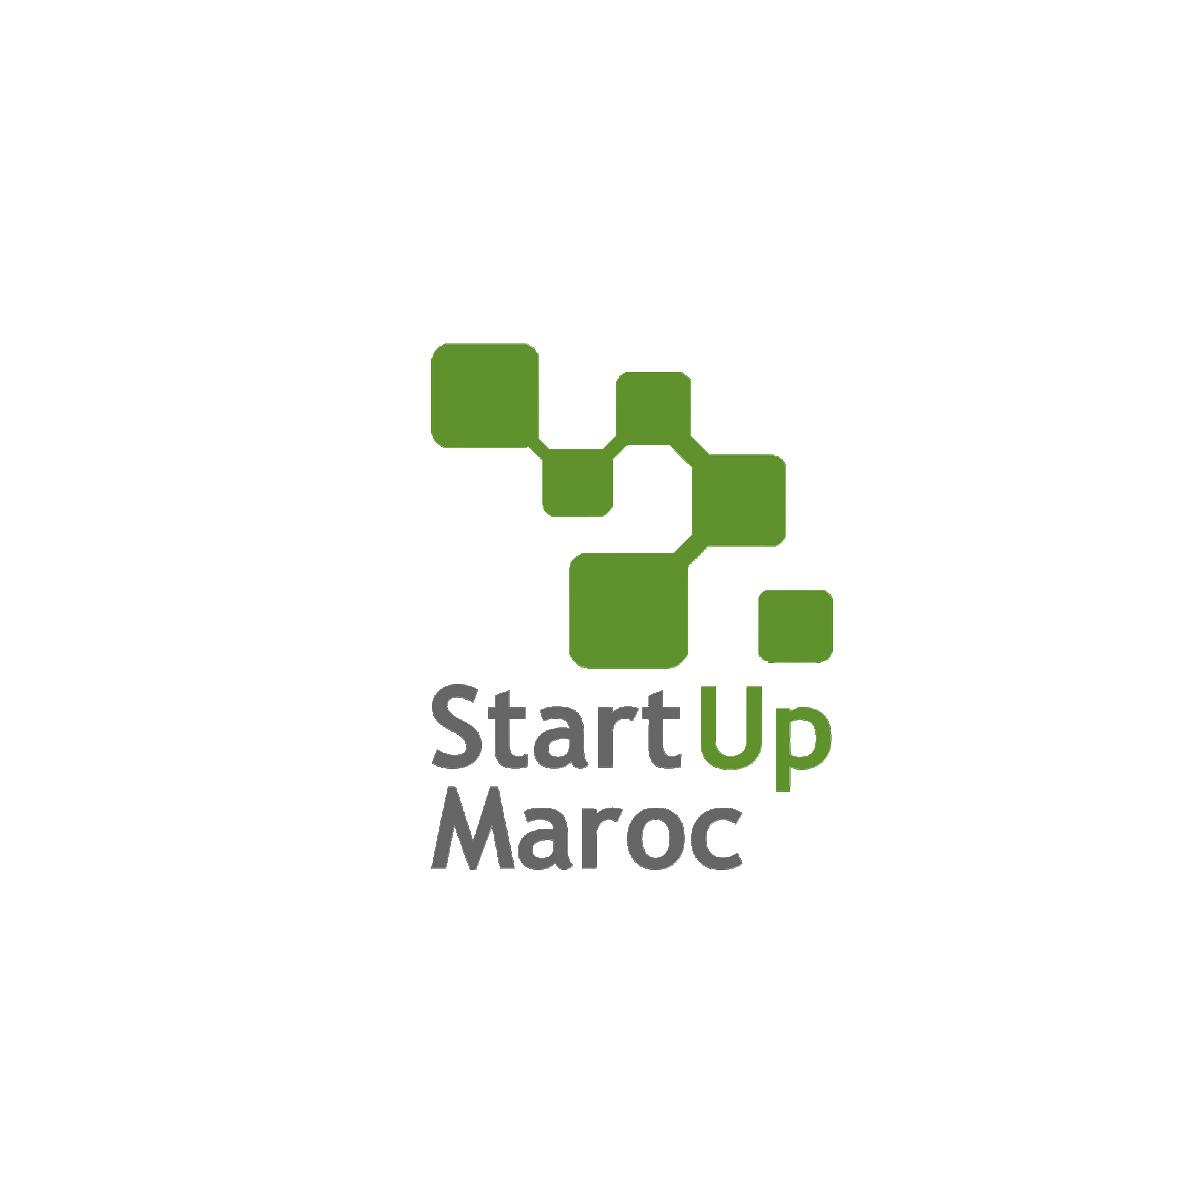 StartUp Maroc Start-up.ma